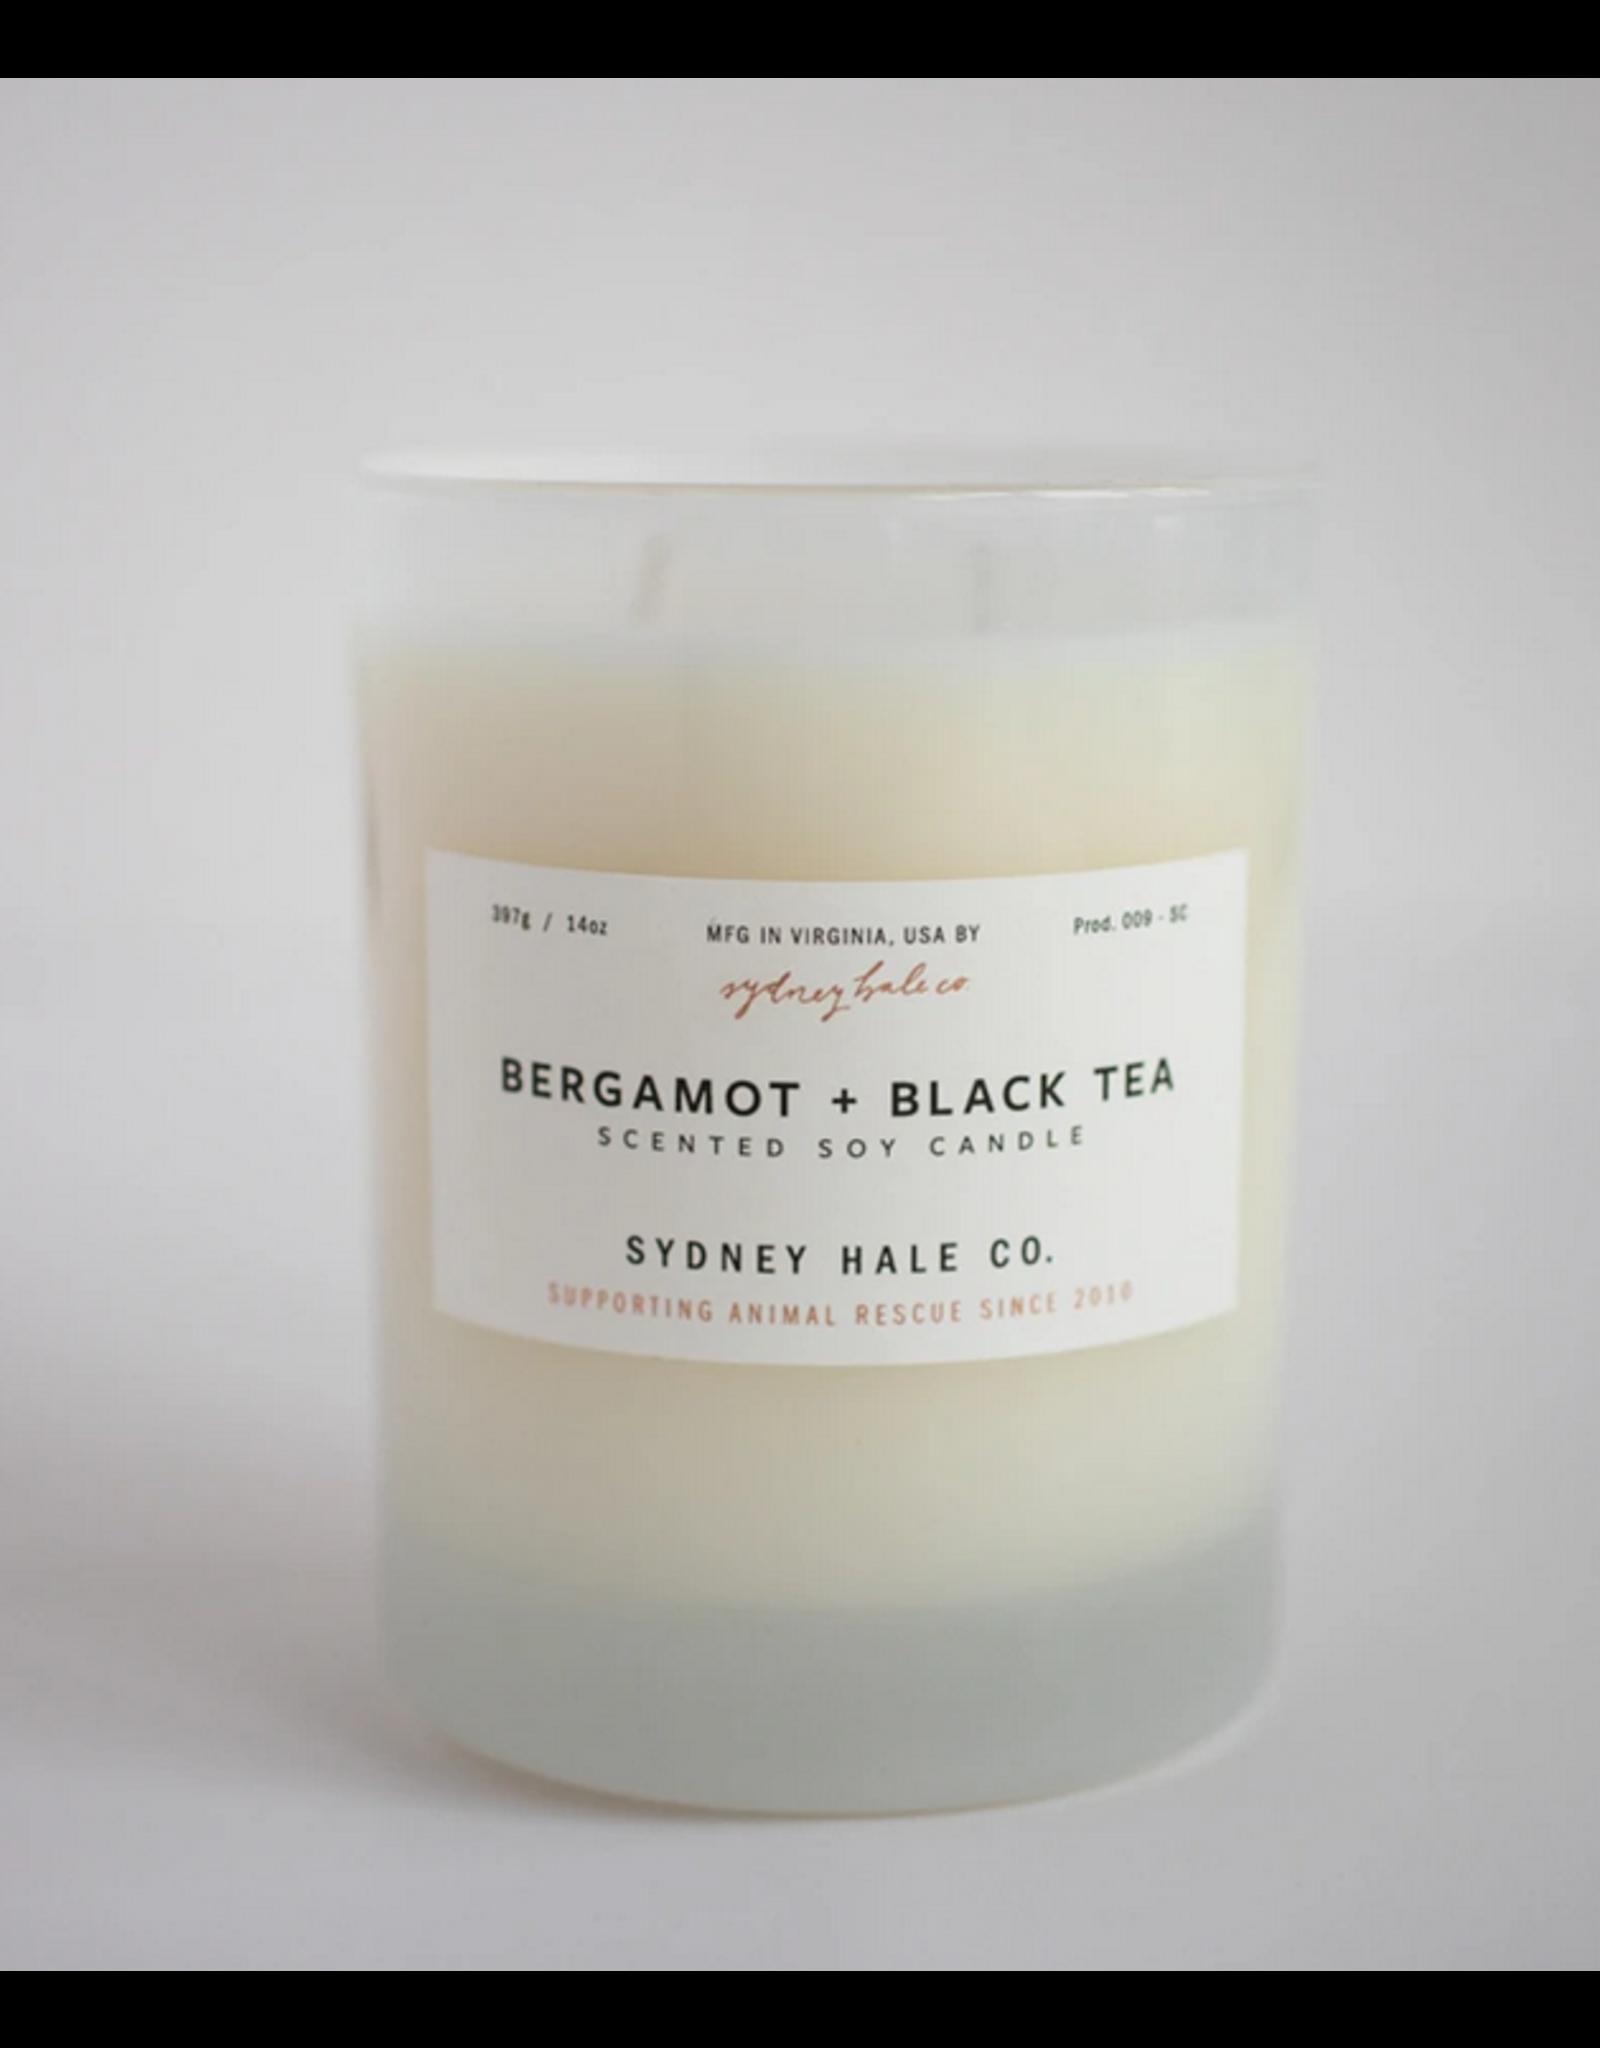 Sydney Hale Co. Clear Glass - Bergamot & Black Tea